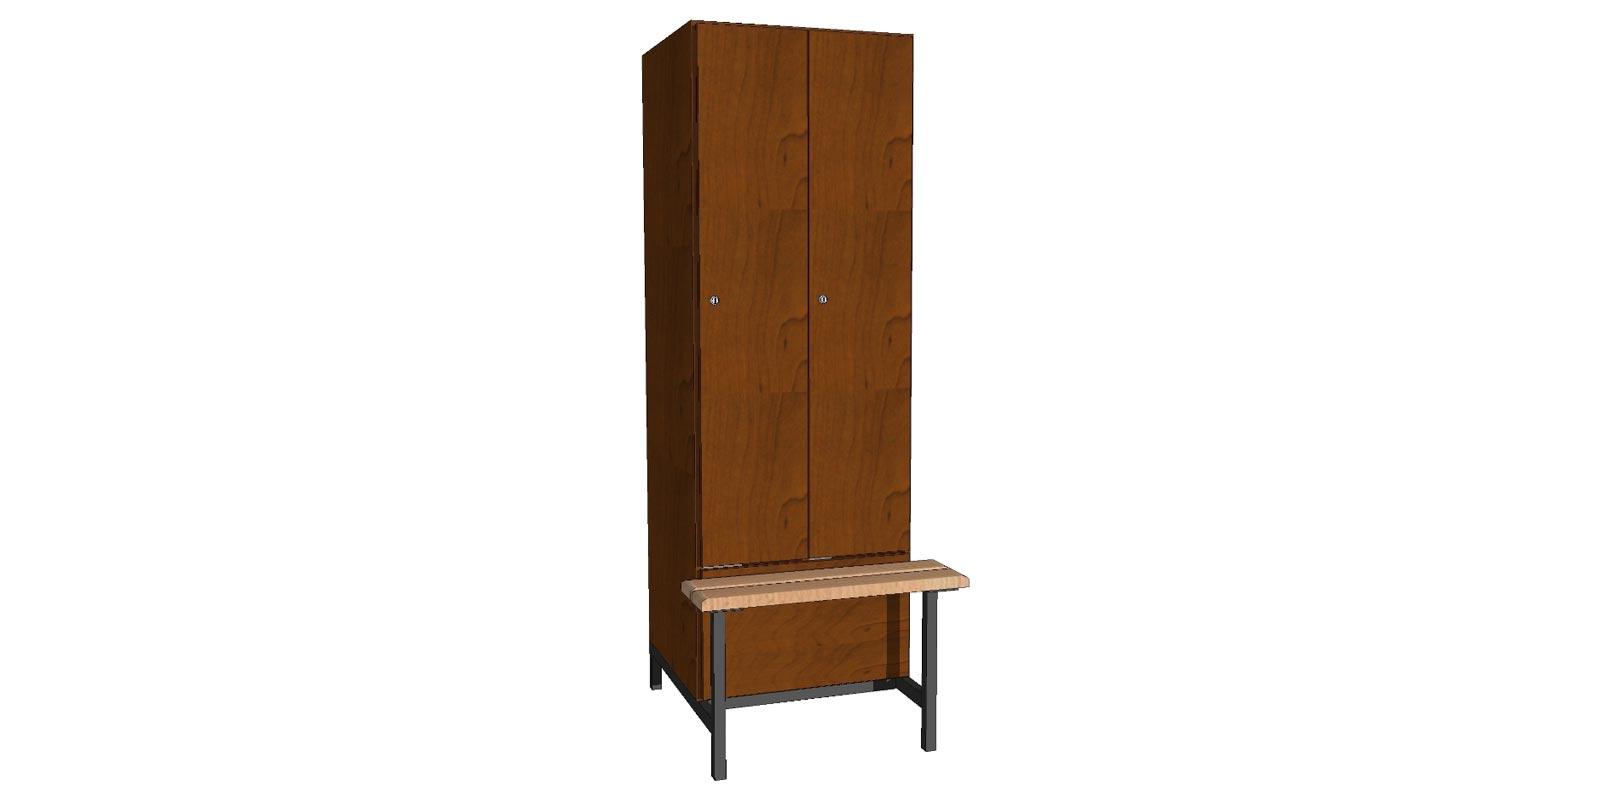 Garderobekast inclusief bank - WHGK03